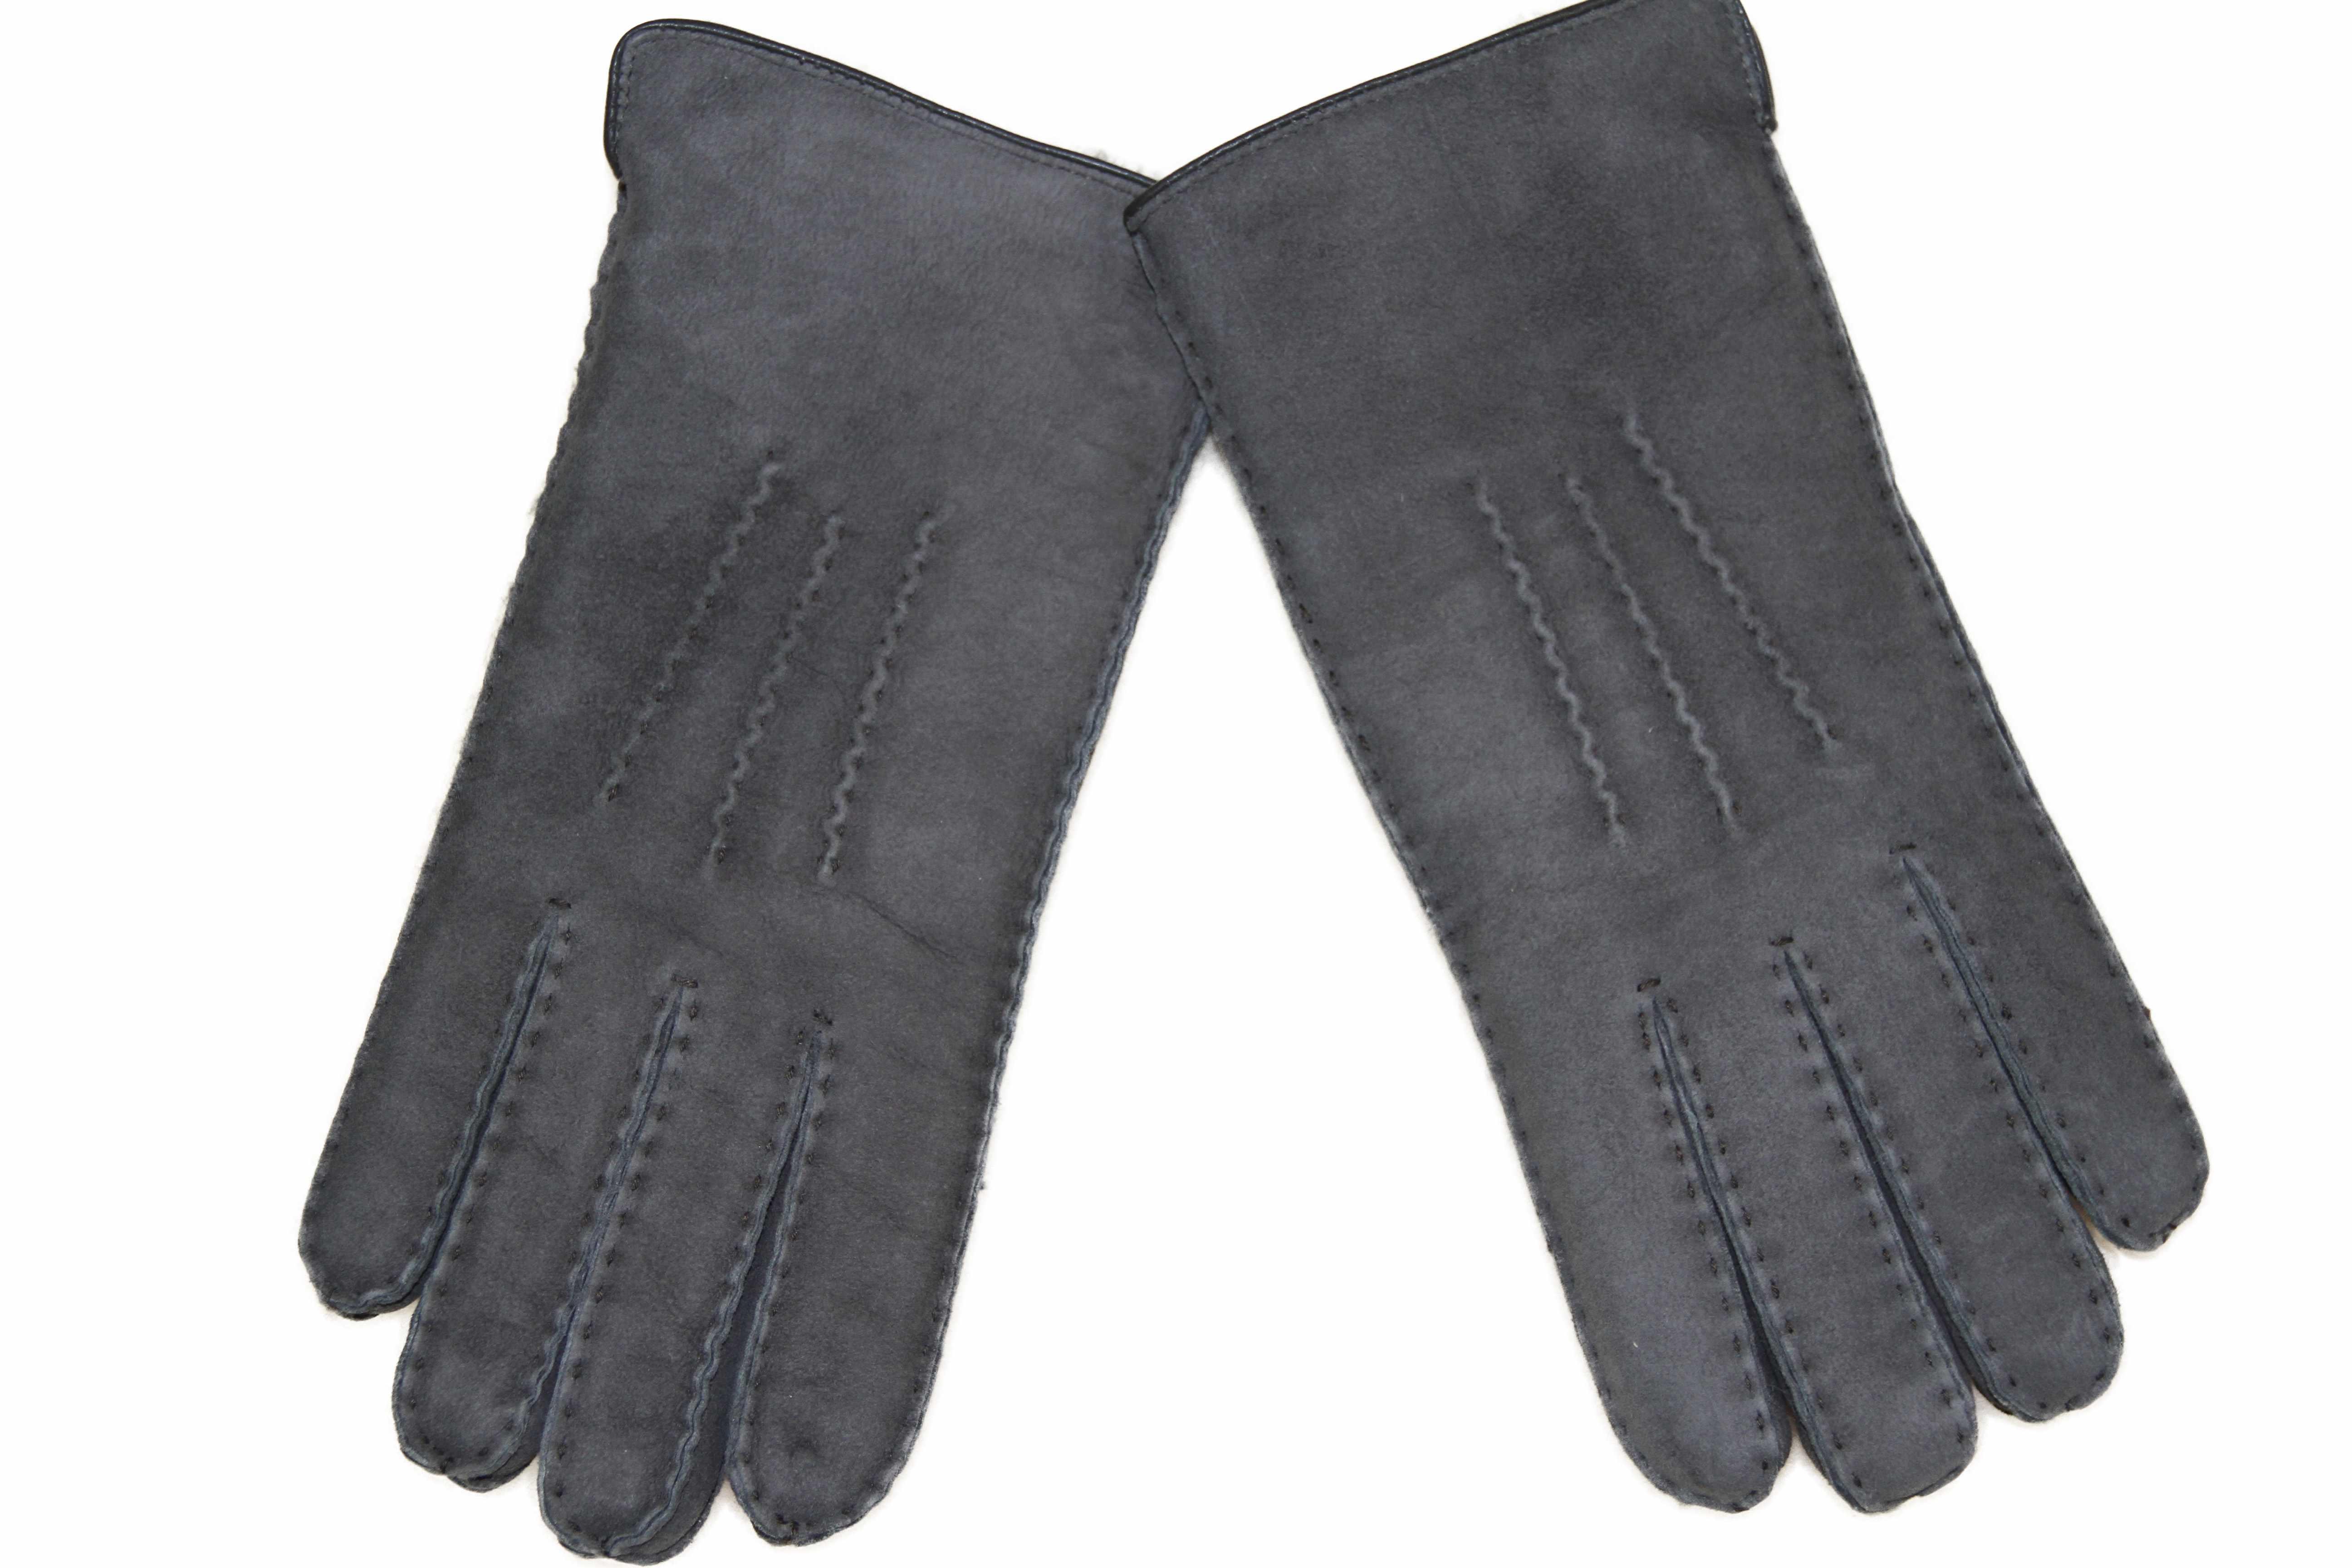 außergewöhnliche Auswahl an Stilen Talsohle Preis geschickte Herstellung GYS 31G – Lammfell Fingerhandschuhe – grau Handschuhe